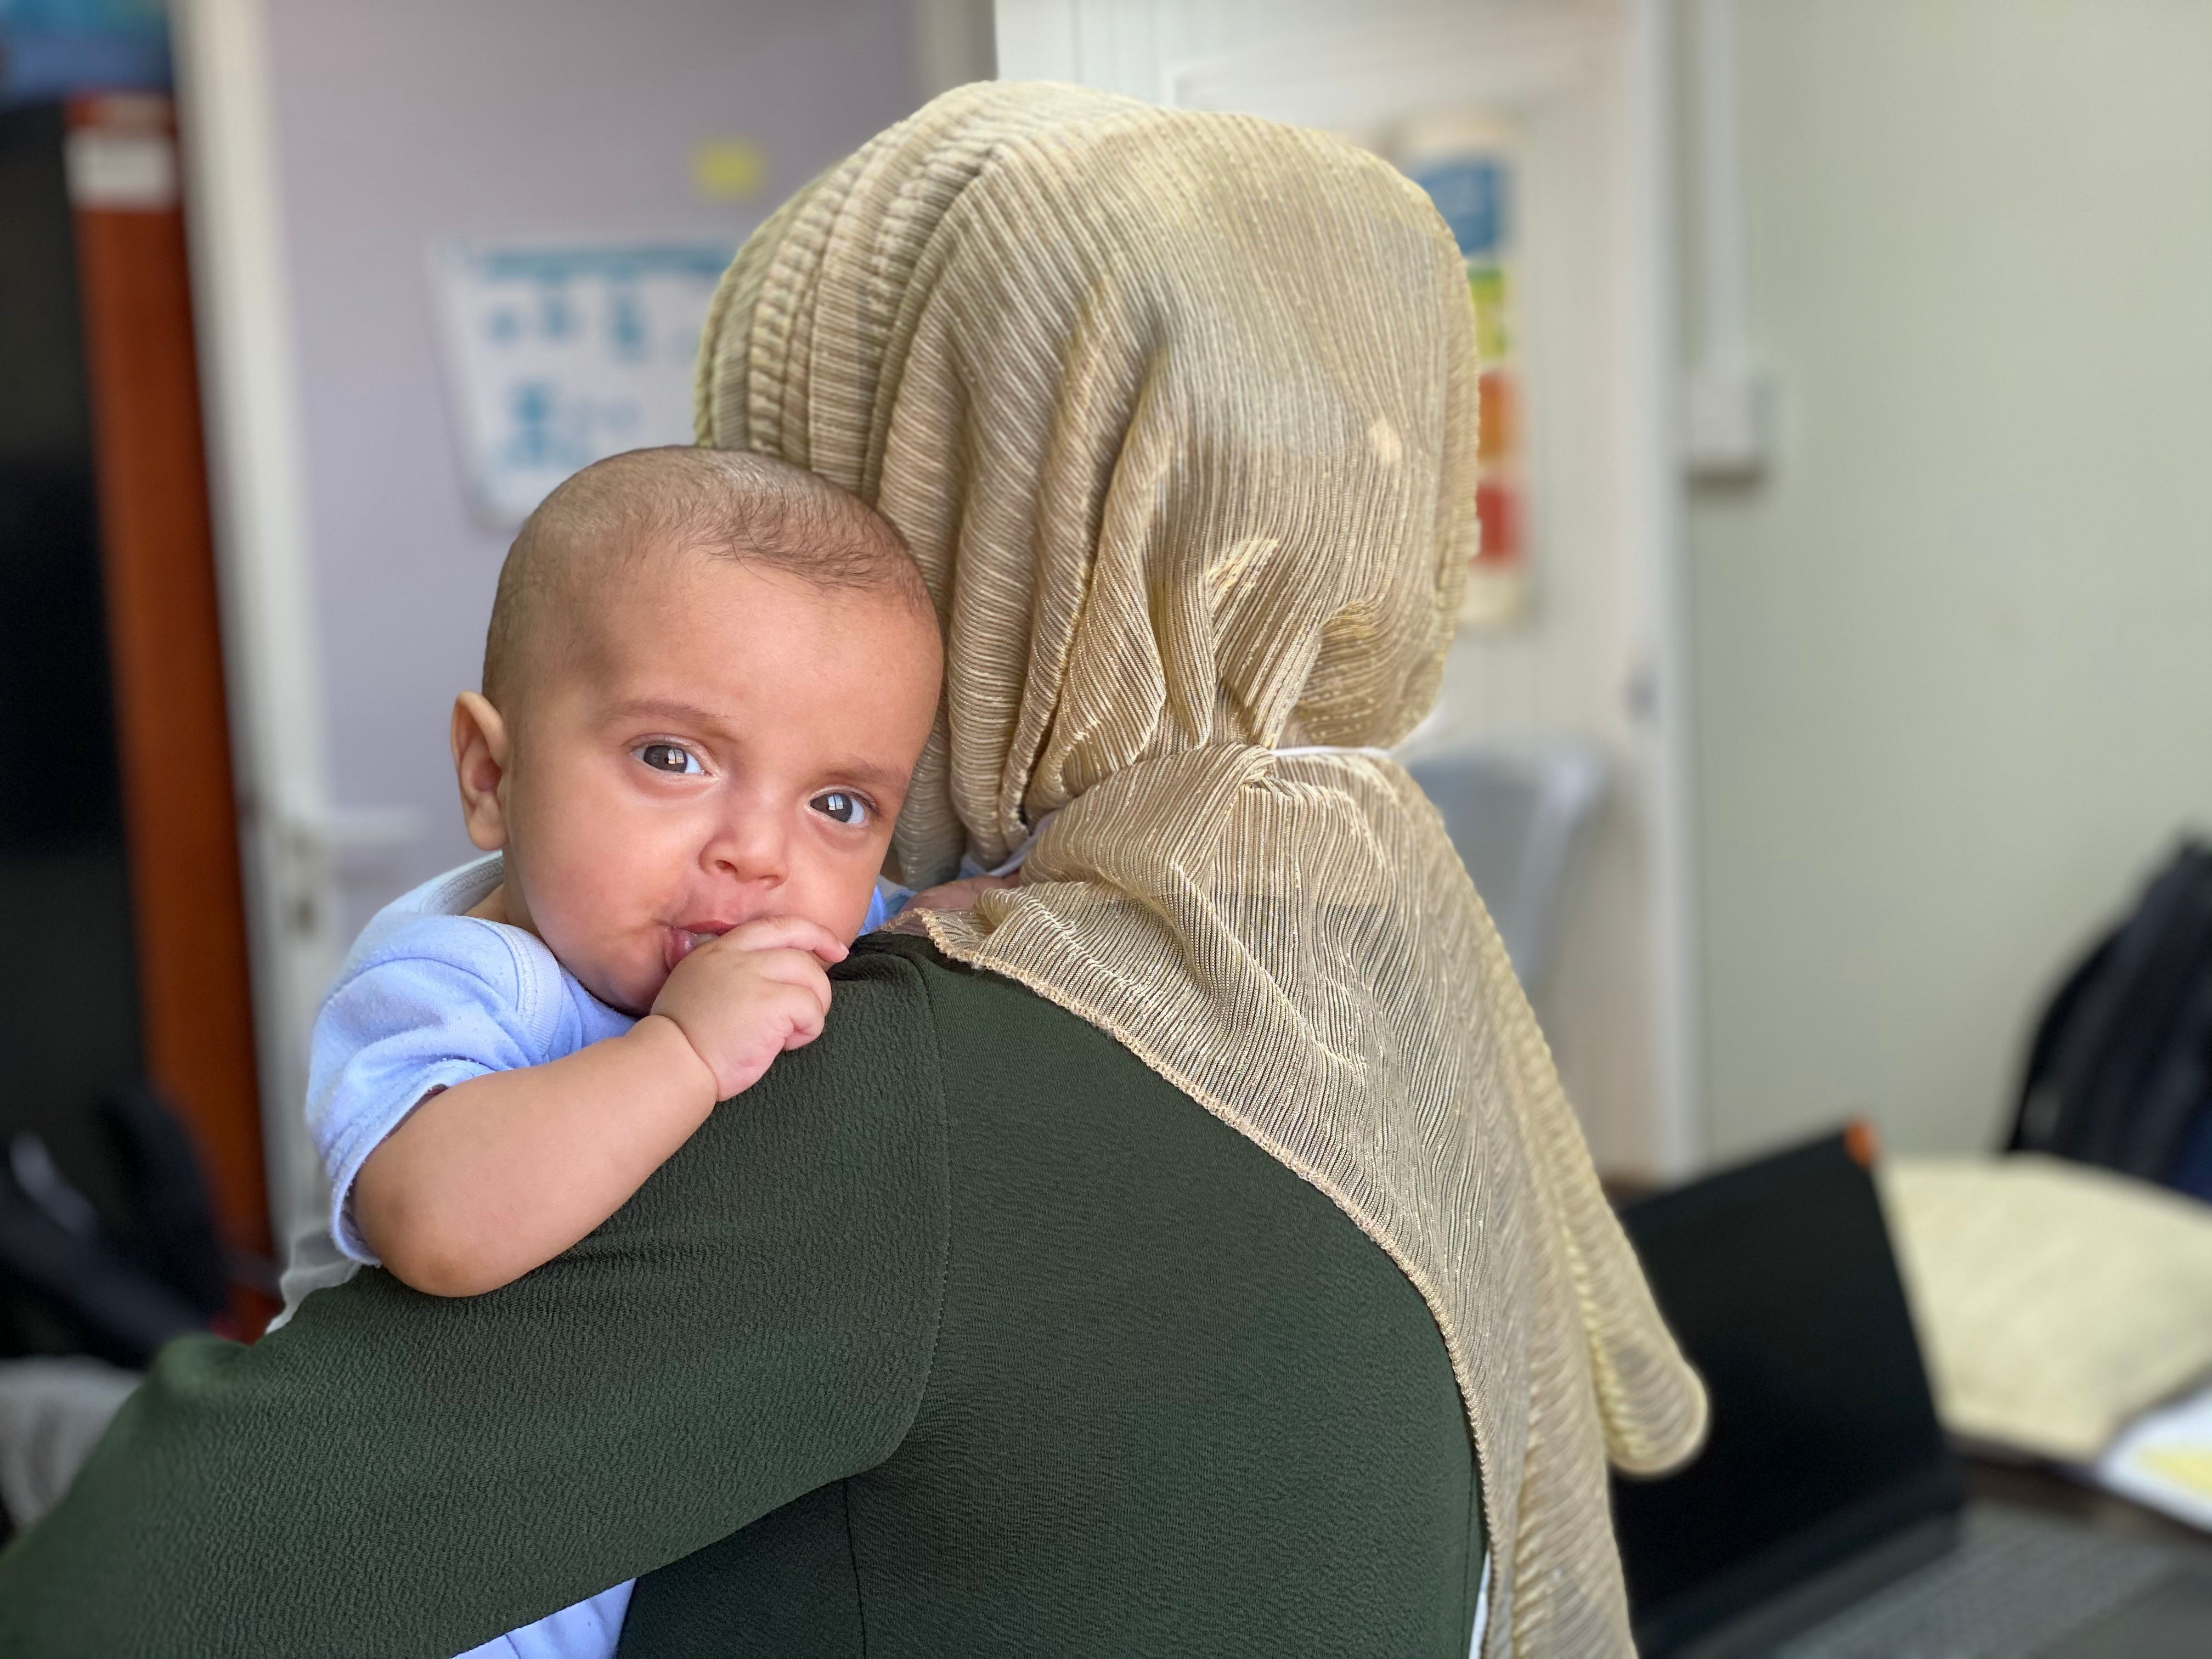 Breastfeeding saves lives - Nasser's story